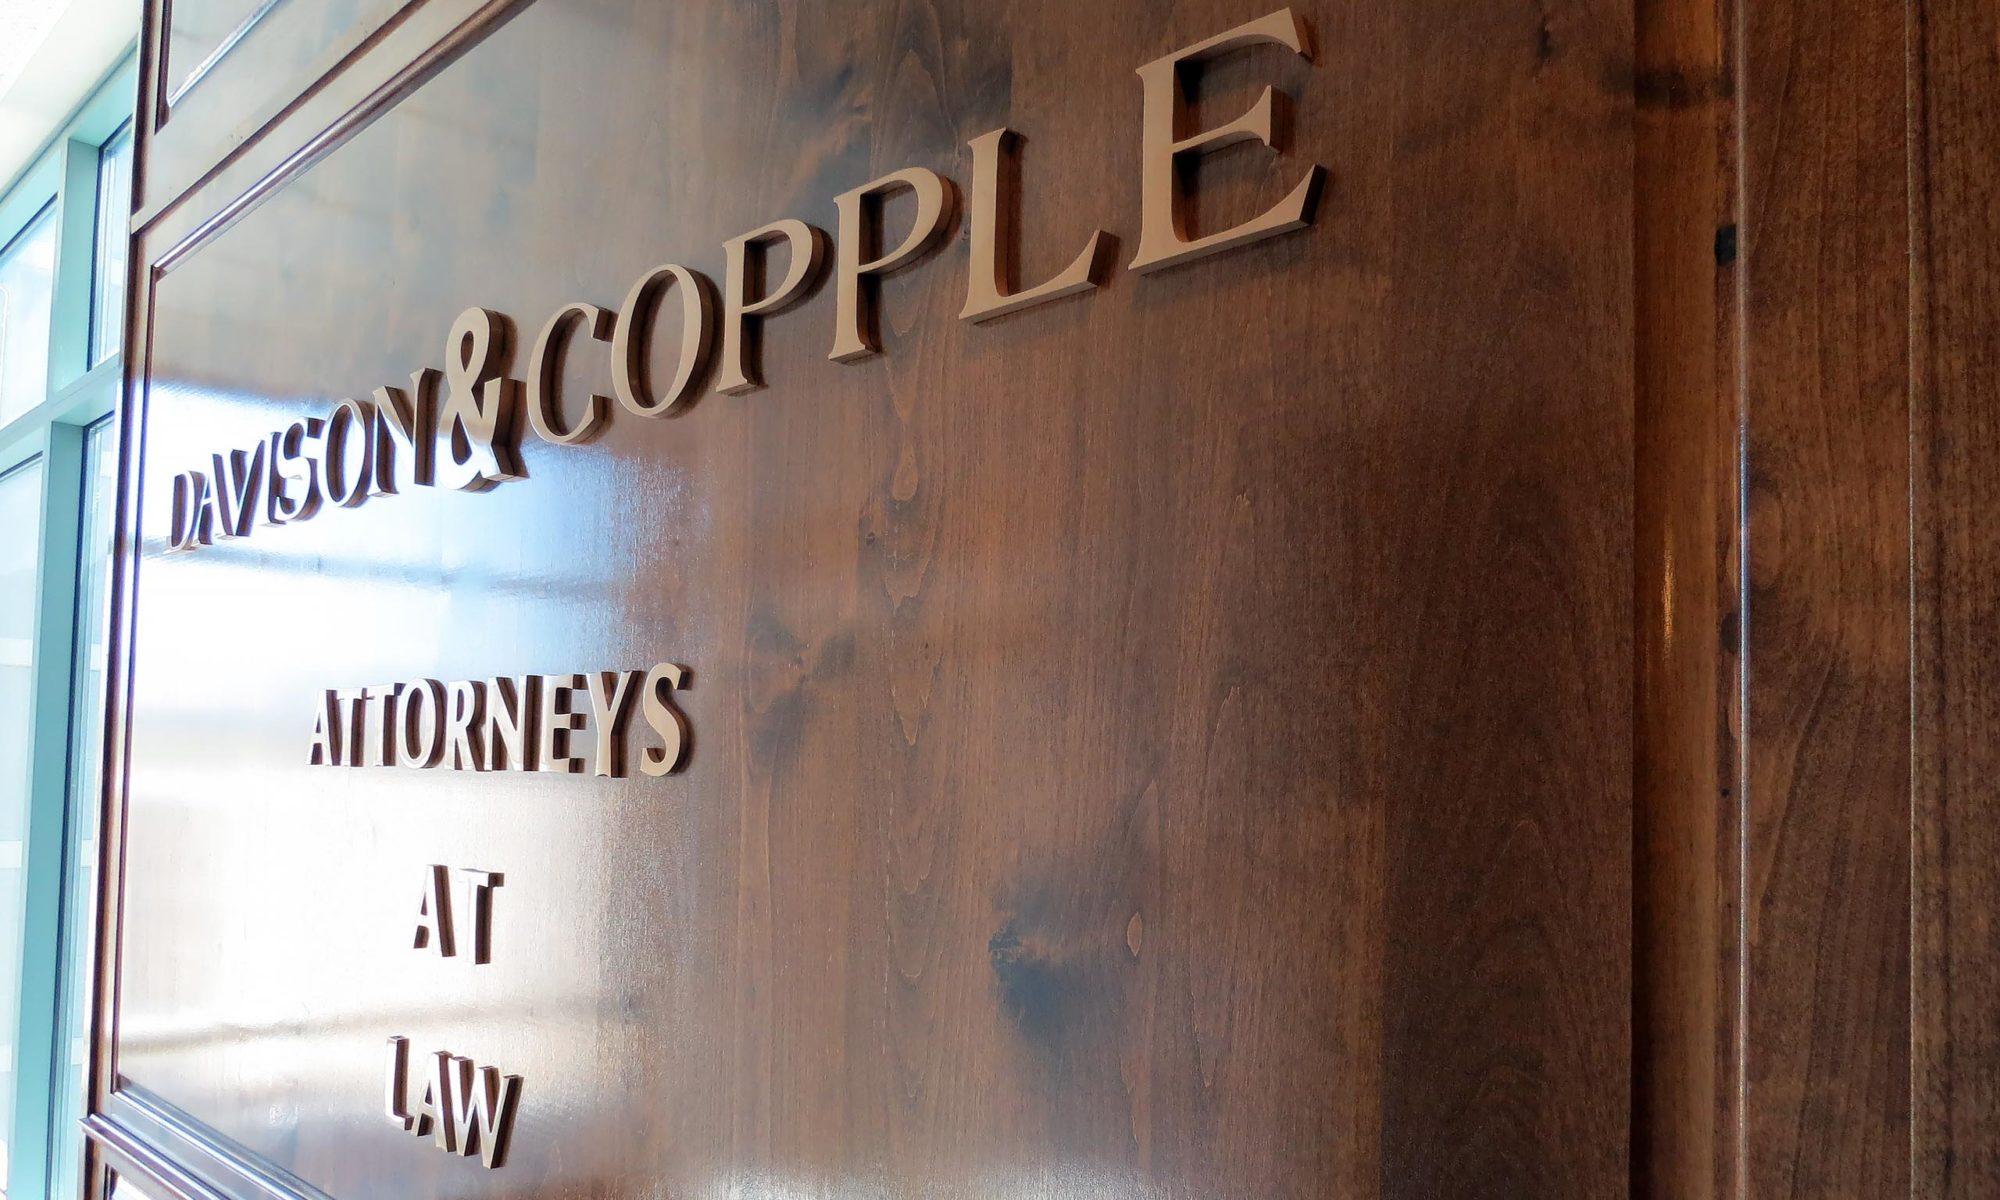 Davison, Copple, Copple, & Copple, LLP